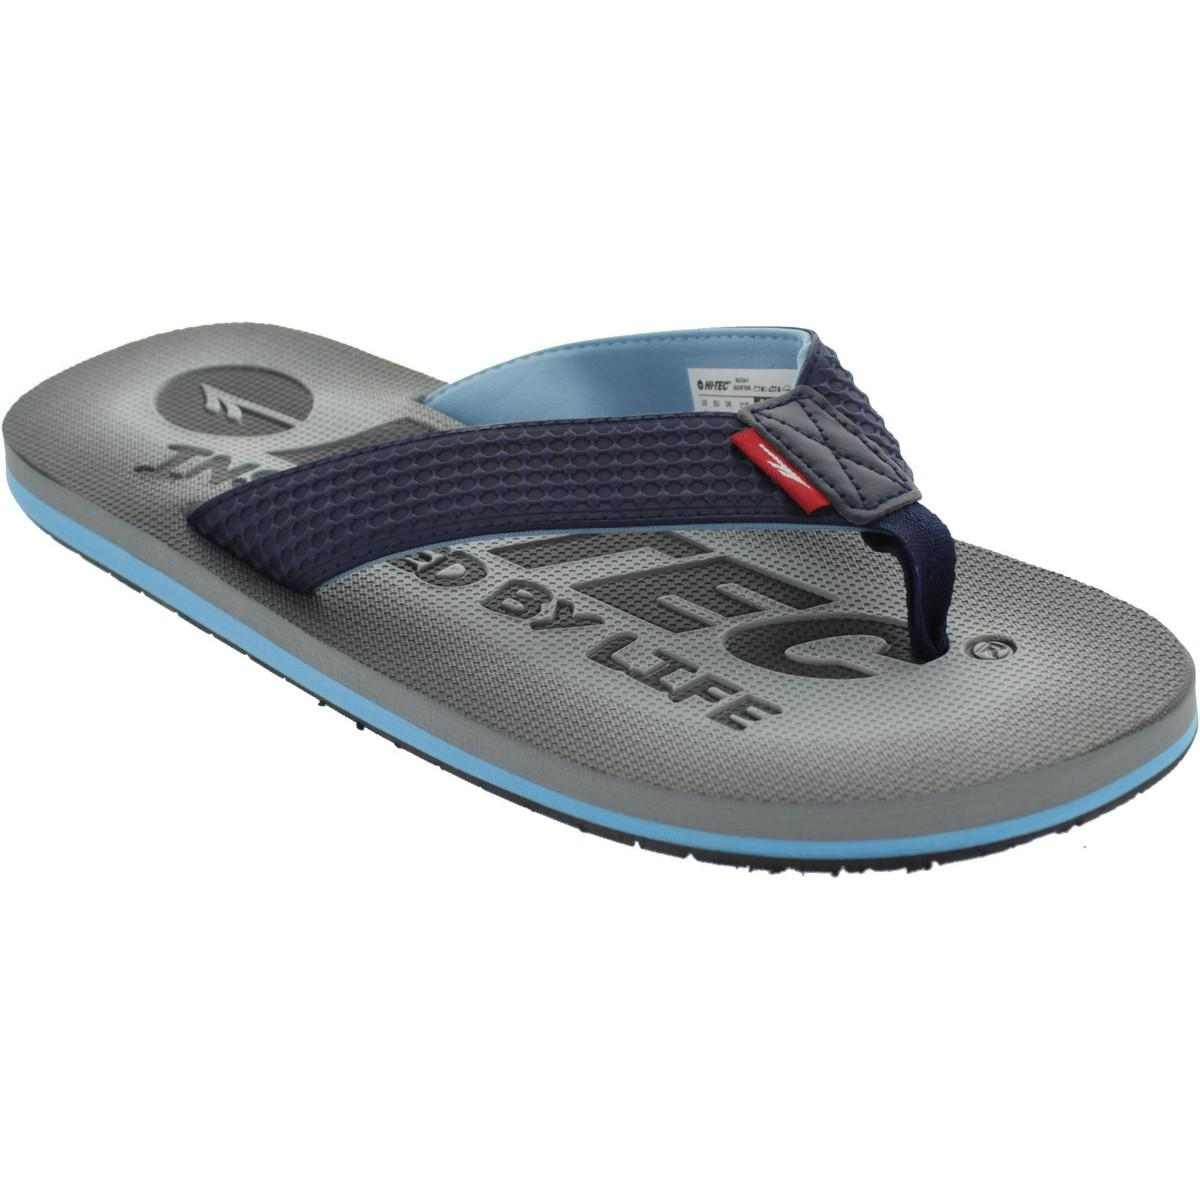 3b0c8d265 Hi-Tec Shadow Thong Men s Flip Flops   Sandals (shoes) In Blue in ...